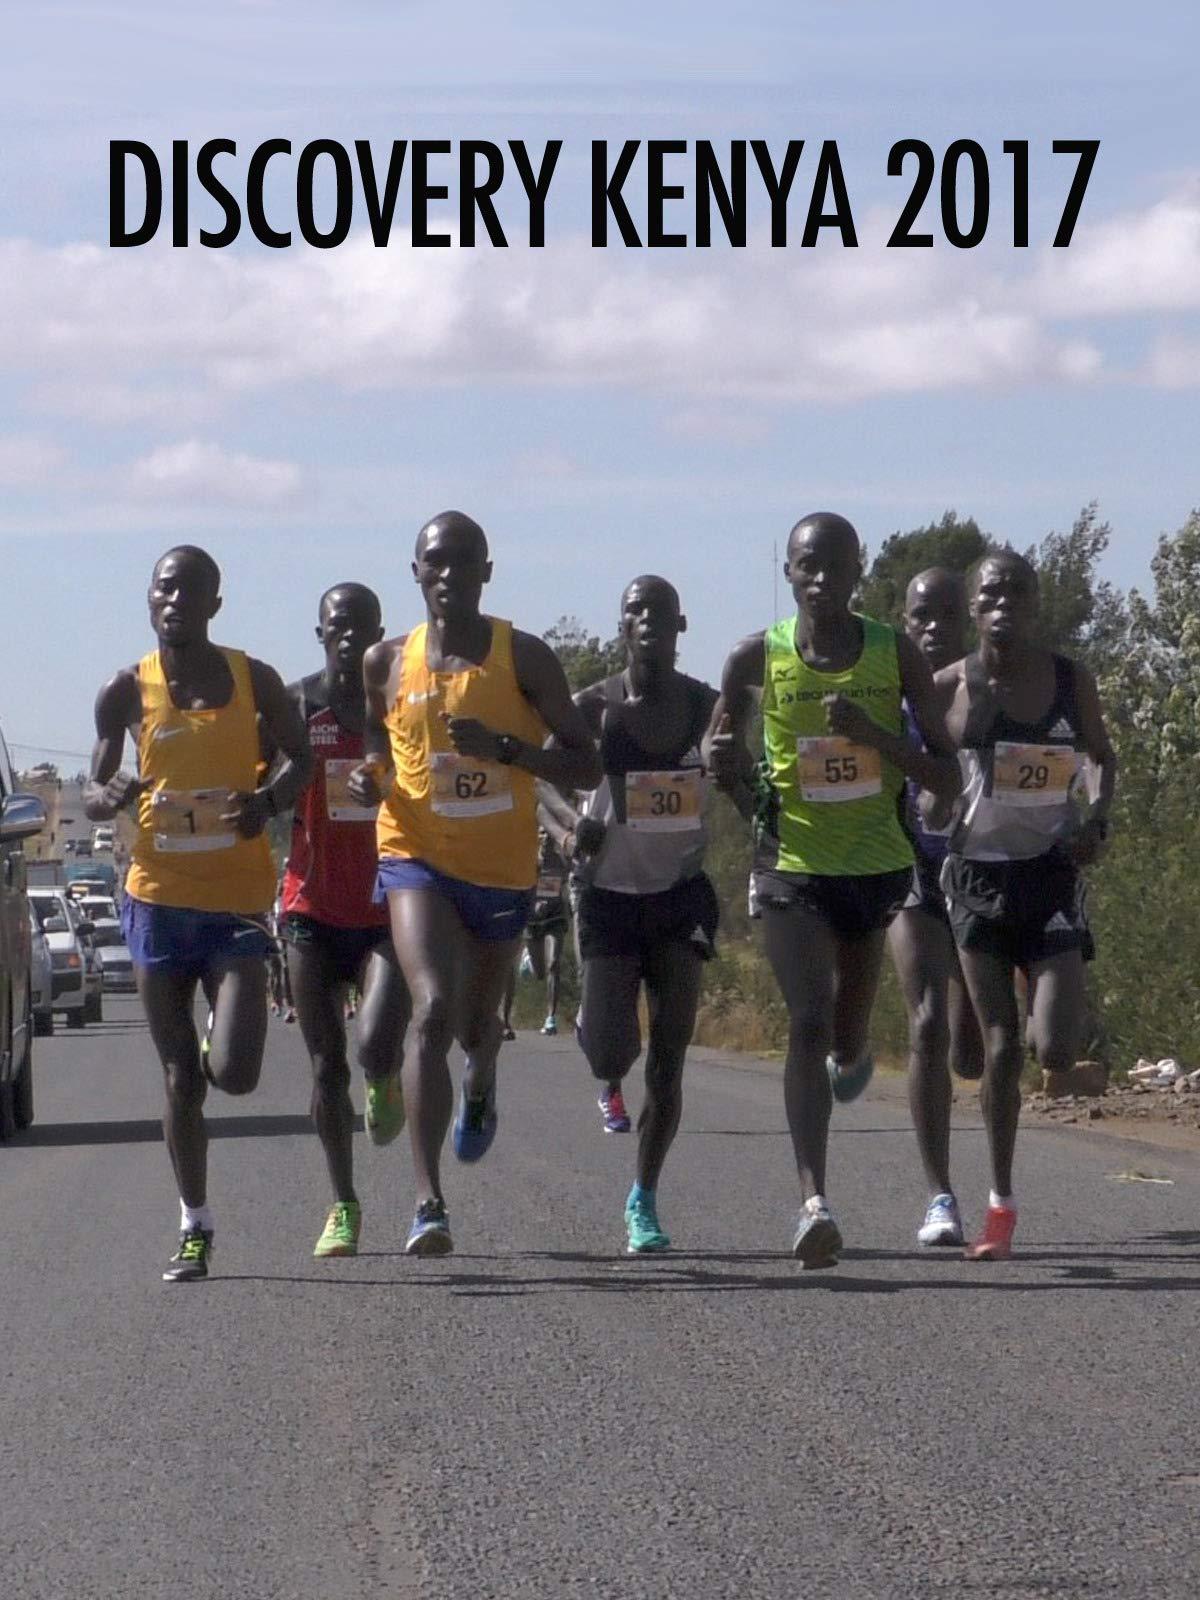 Discovery Kenya 2017